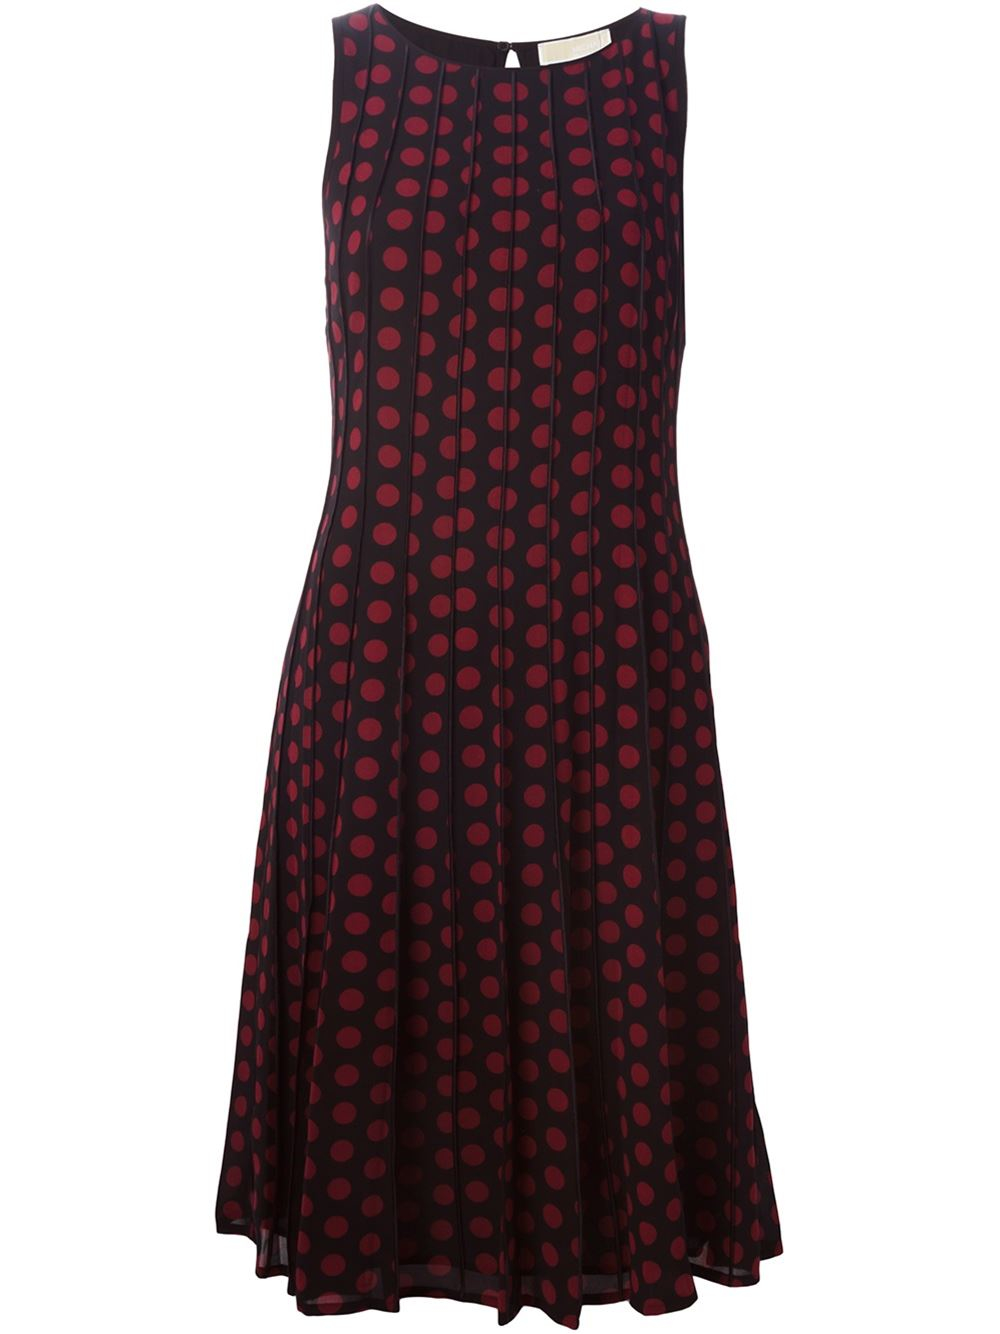 michael-michael-kors-black-sleeveless-polka-dot-dress-product-0-714821187-normal.jpeg